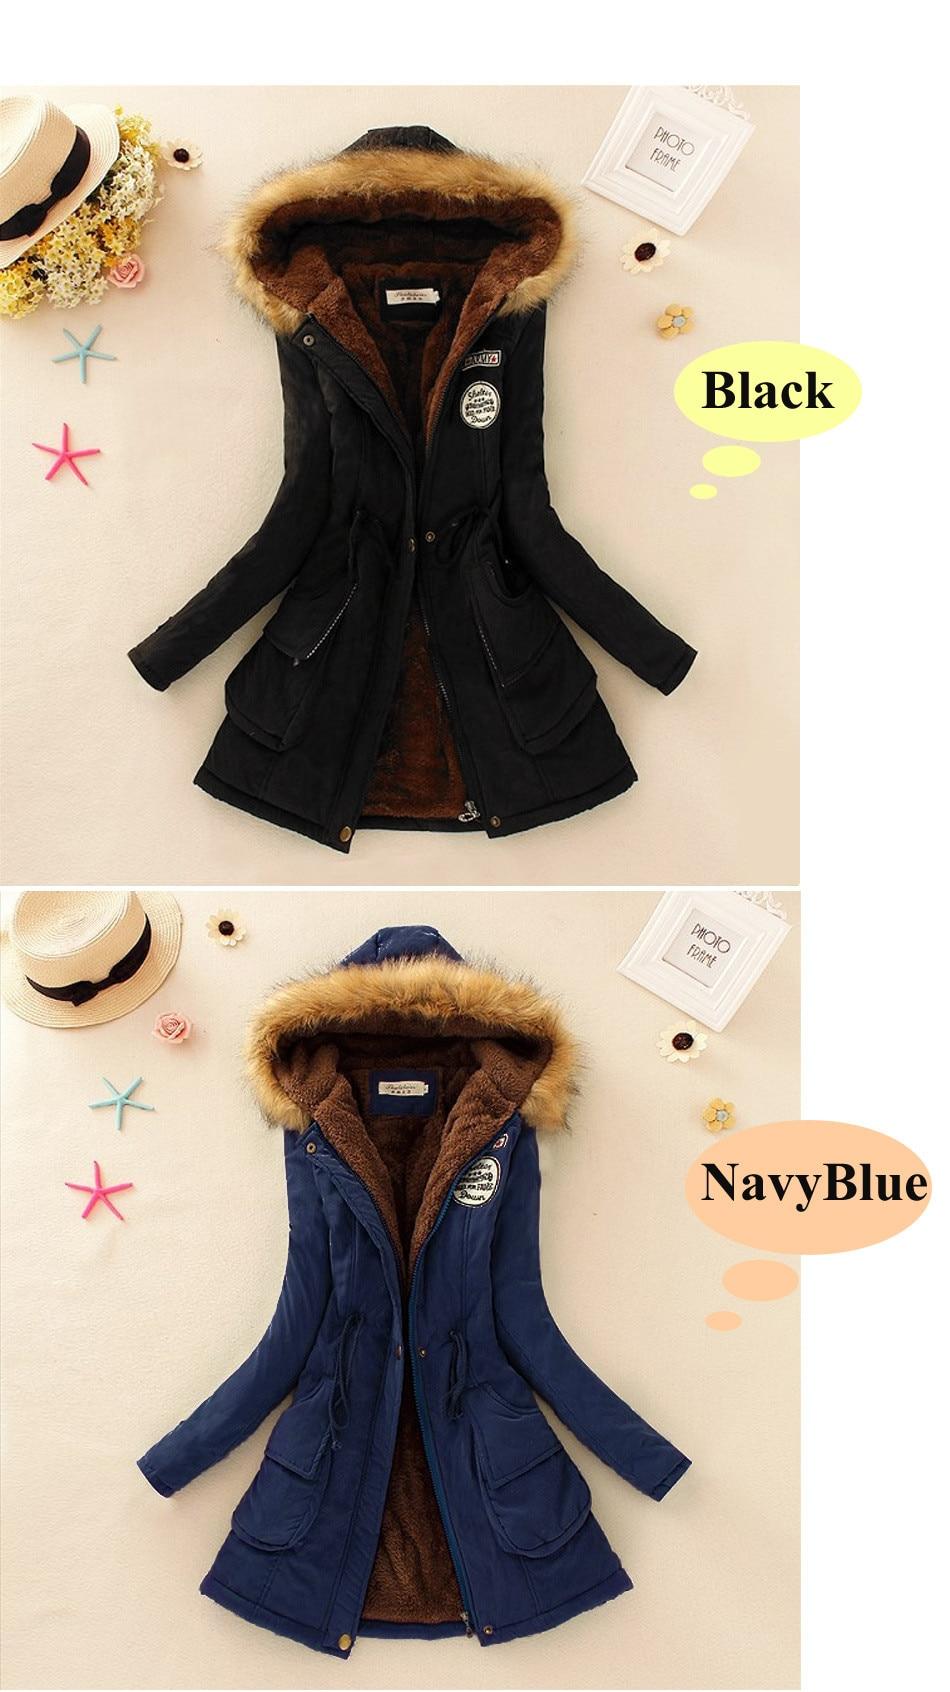 7394265b5a0 Autumn Warm Winter Jacket Women Fashion Women s Fur Collar Coats ...